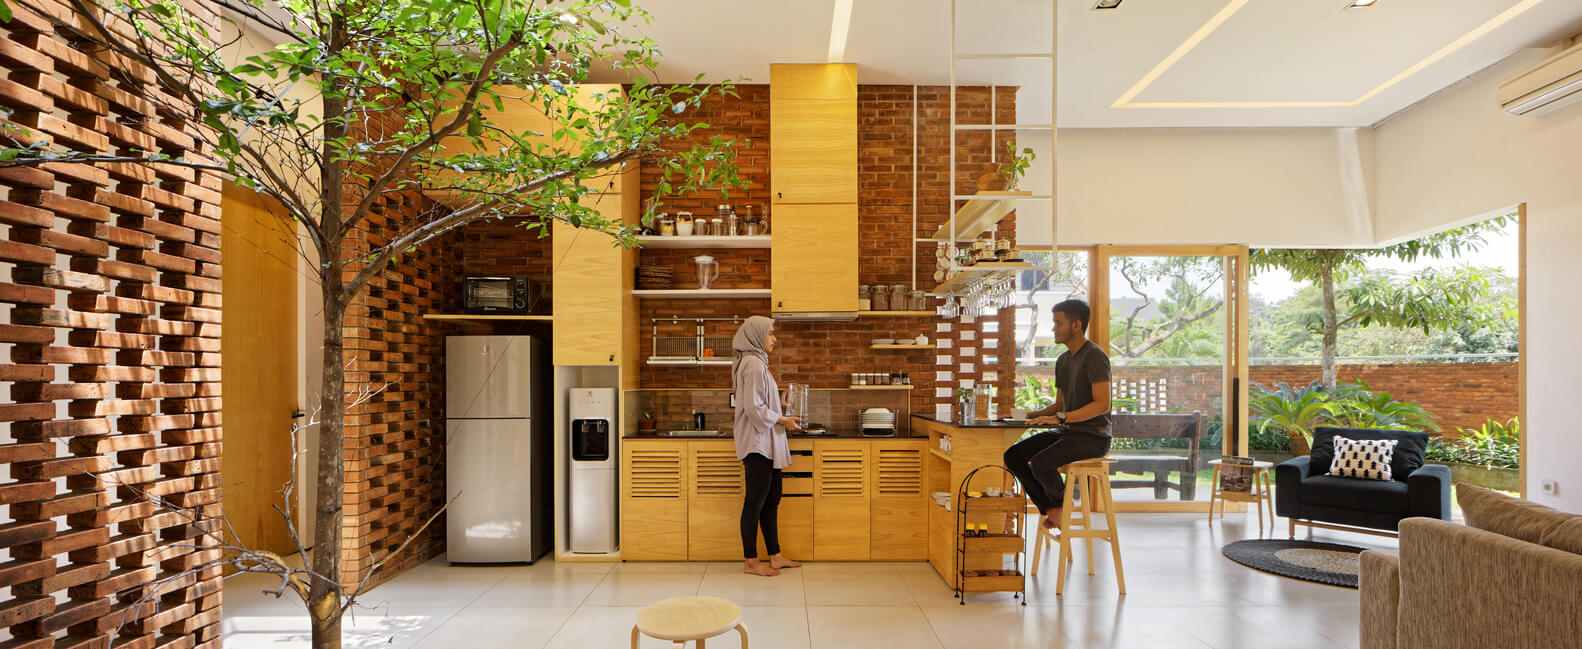 Dapur Terbuka dengan Dinding Bata yang Apik (Sumber: archdaily.com)